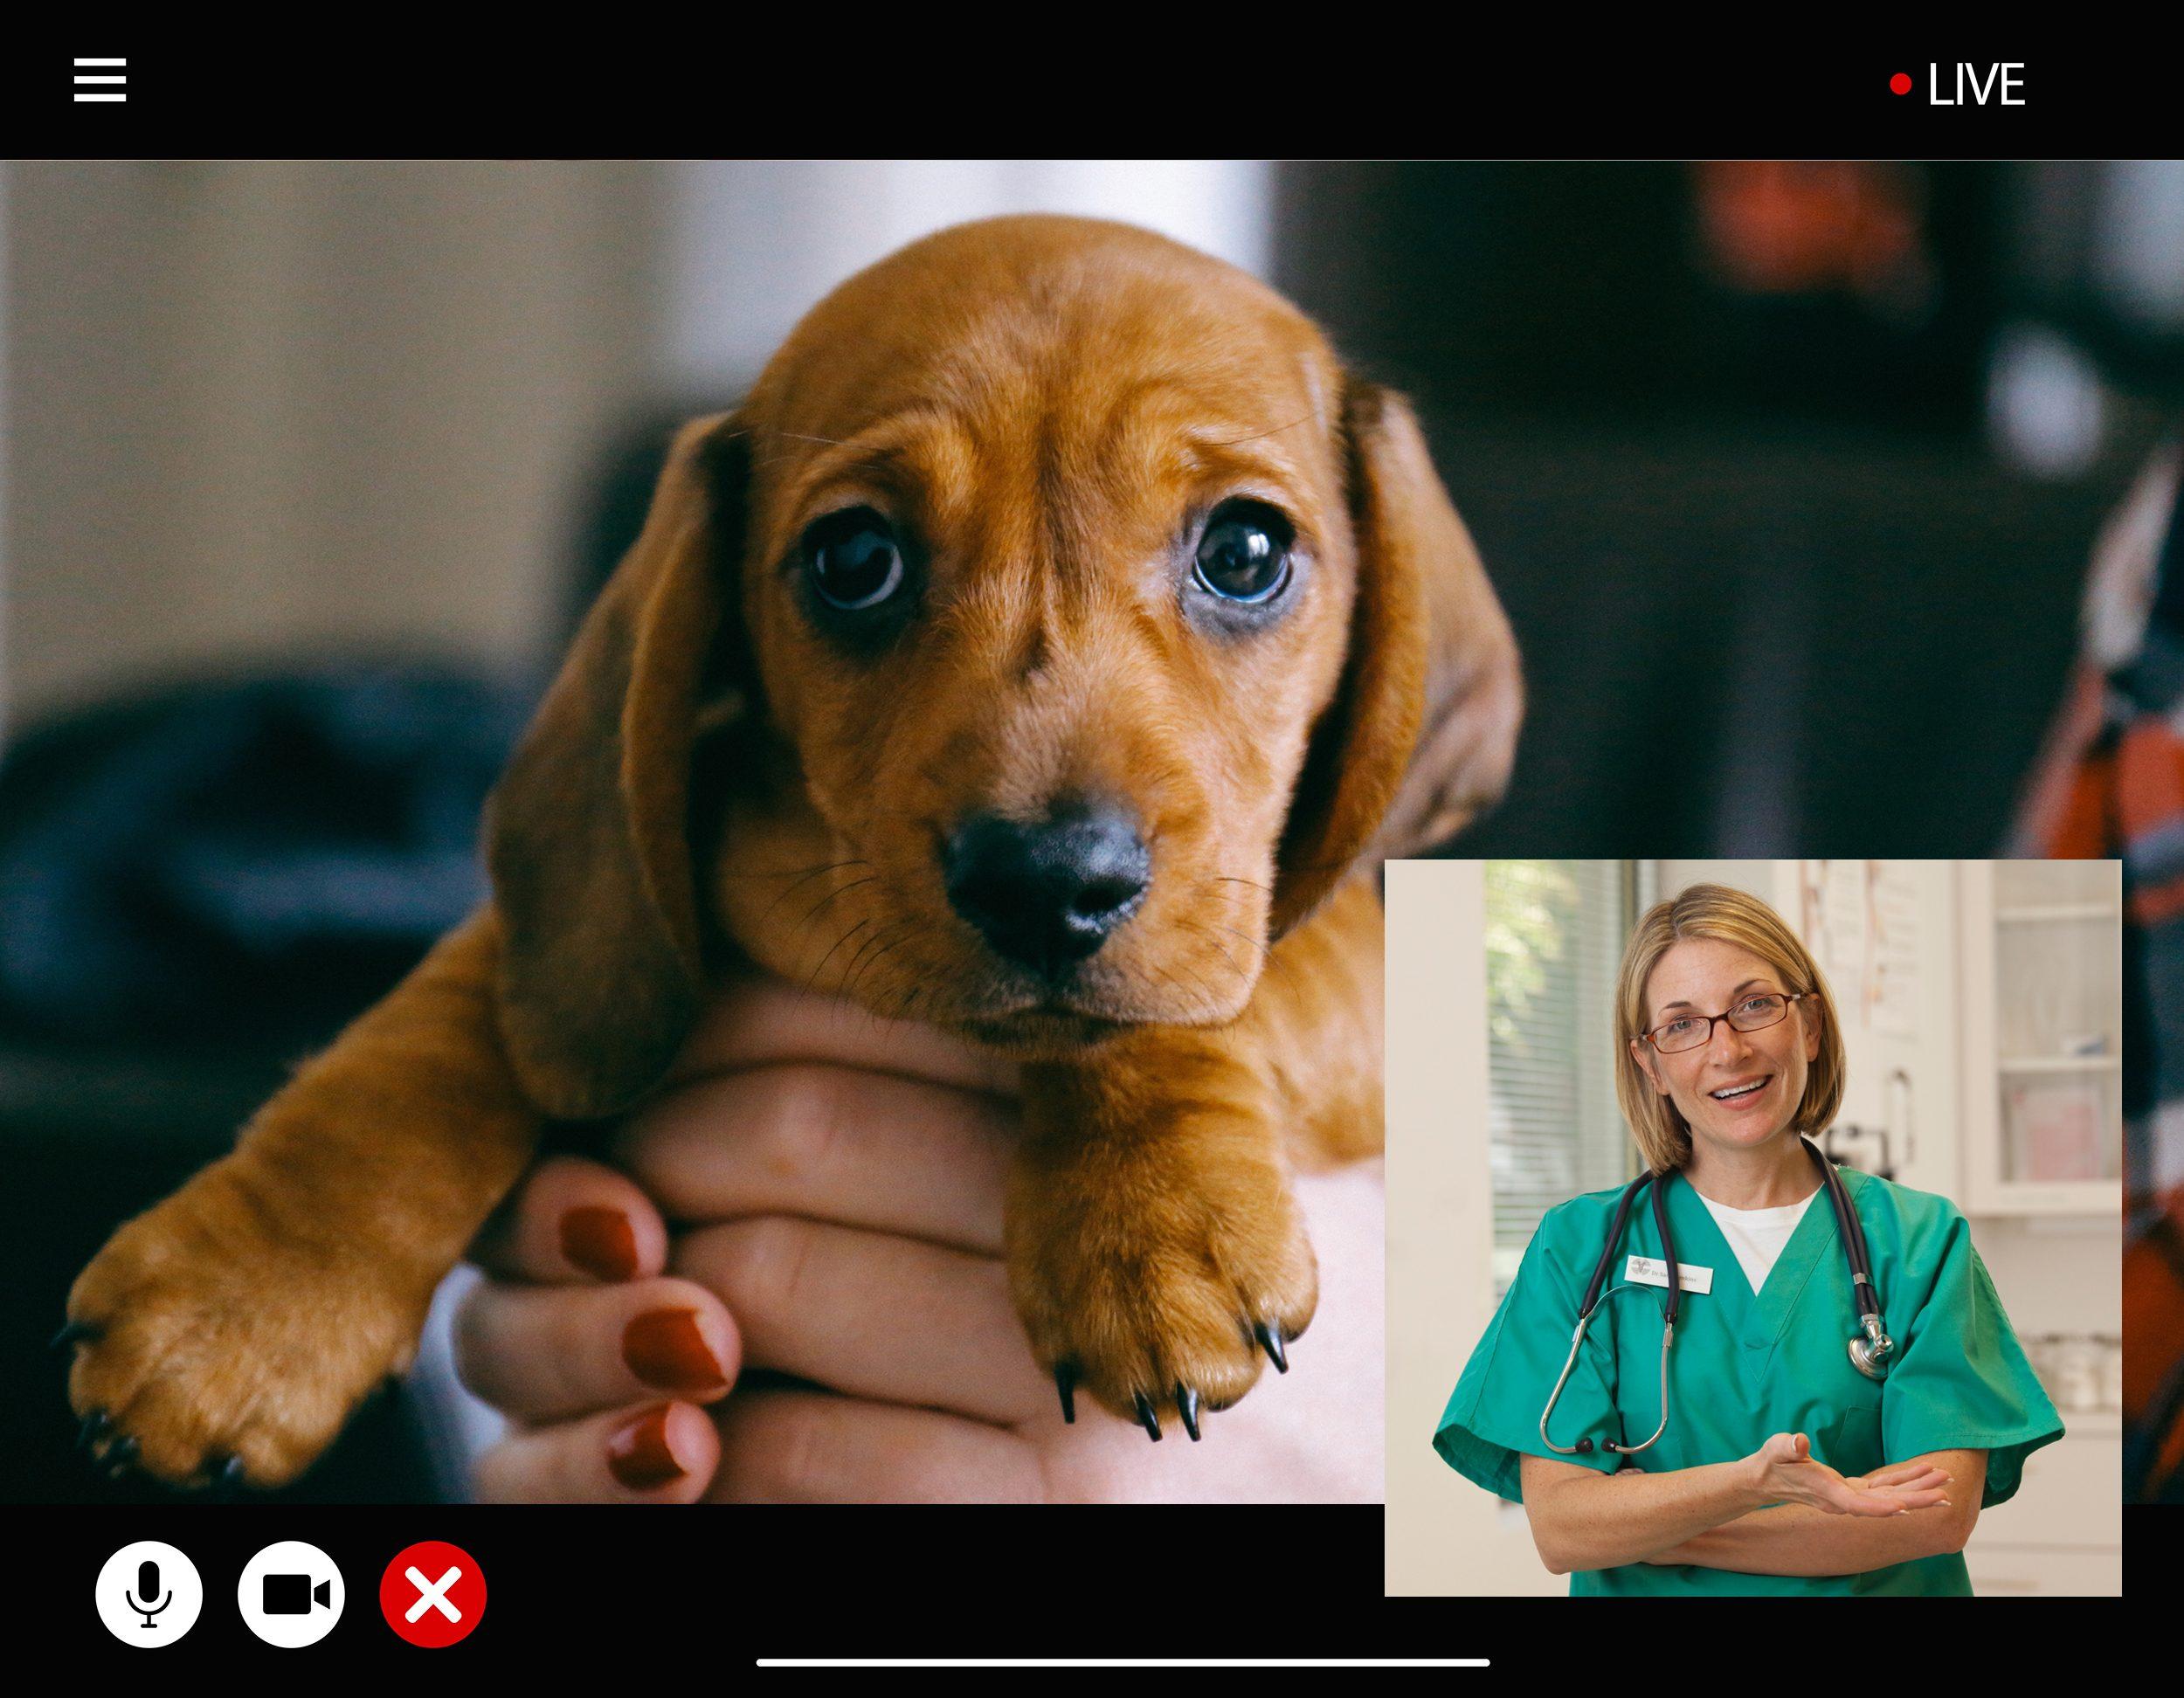 veterinarian vet televet telemedicine pets